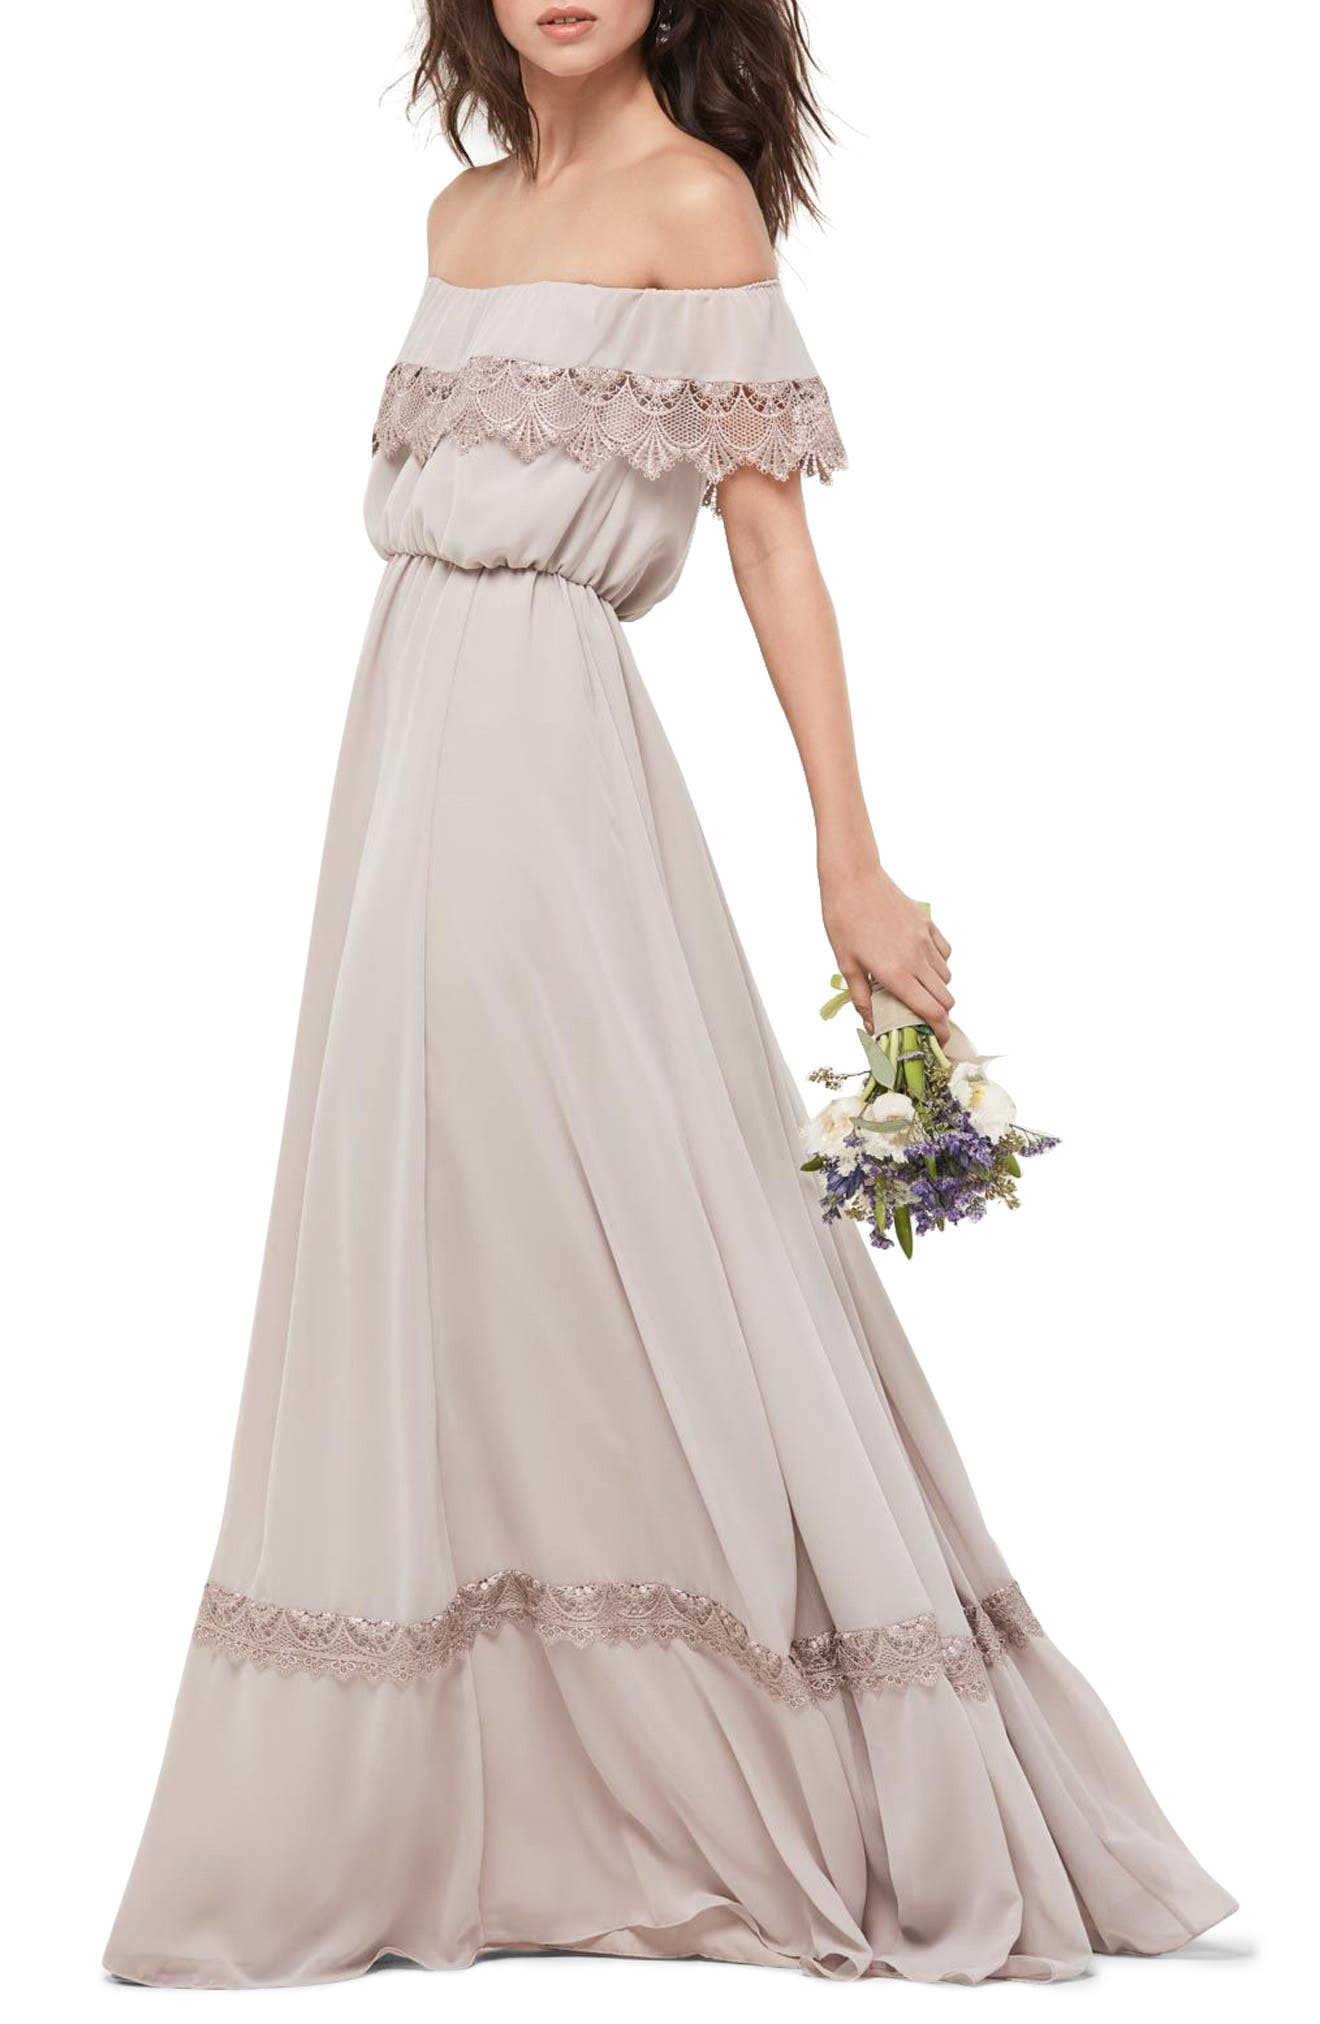 Inna Off the Shoulder Chiffon Blouson Gown,                         Main,                         color, 260